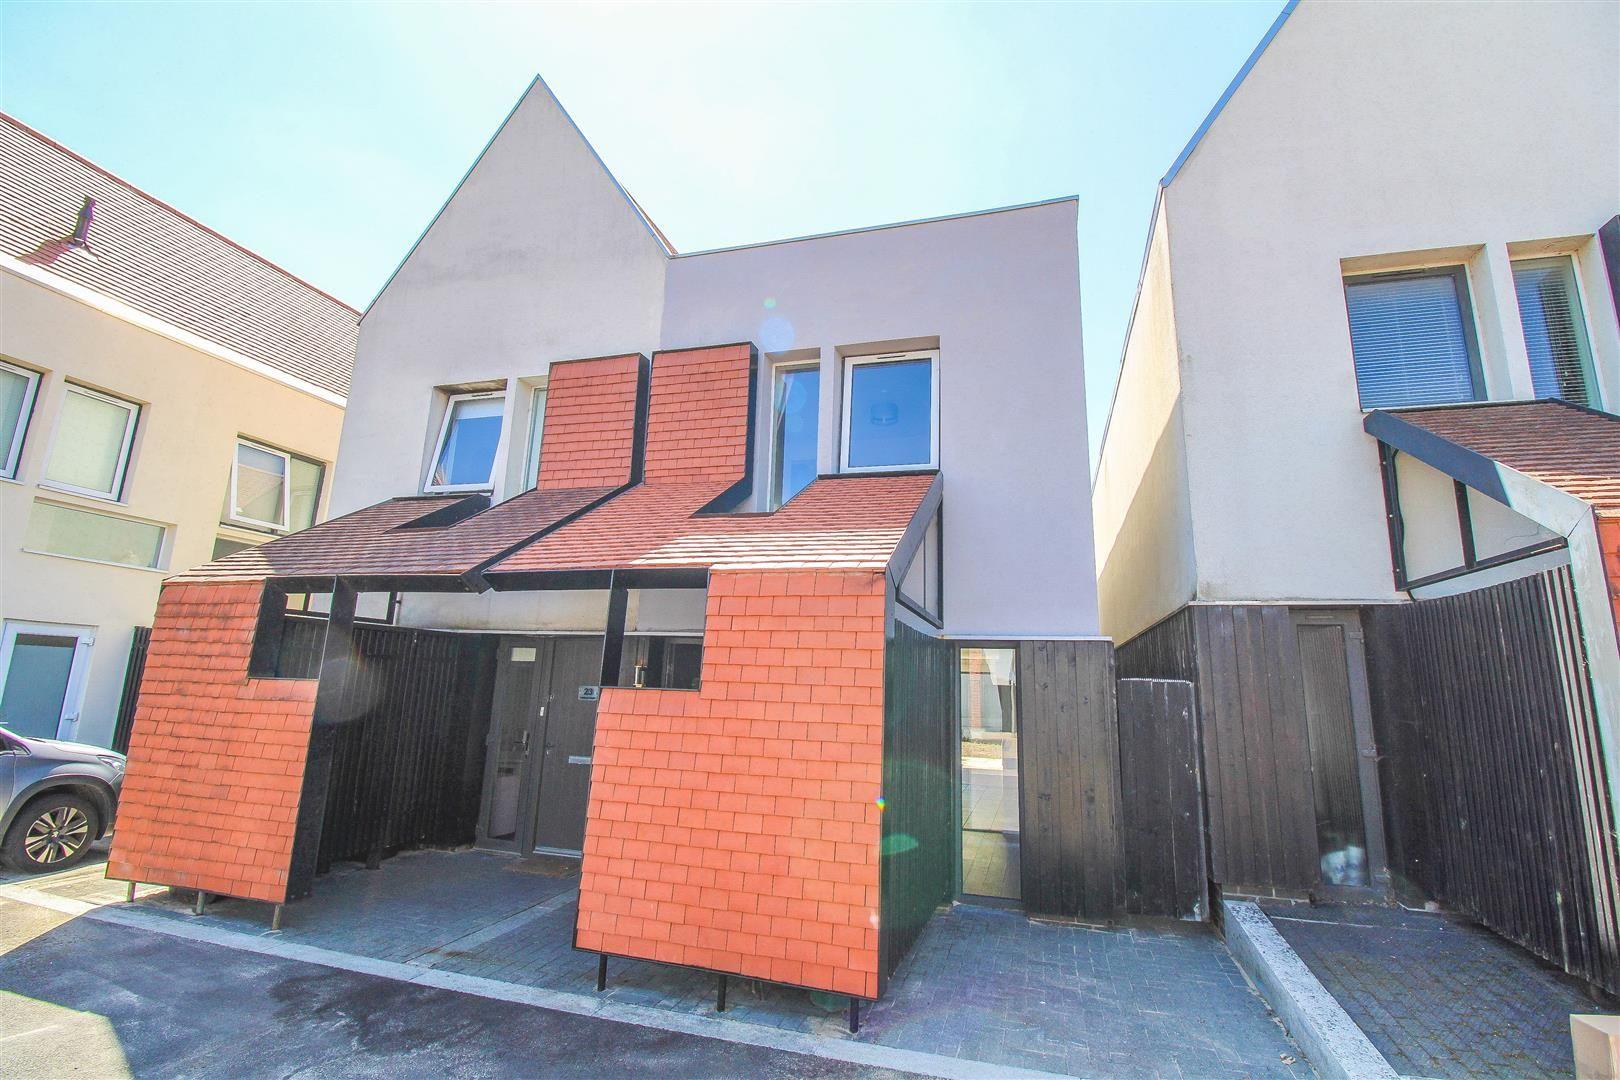 Property photo 1 of 10. Img_3266.Jpg